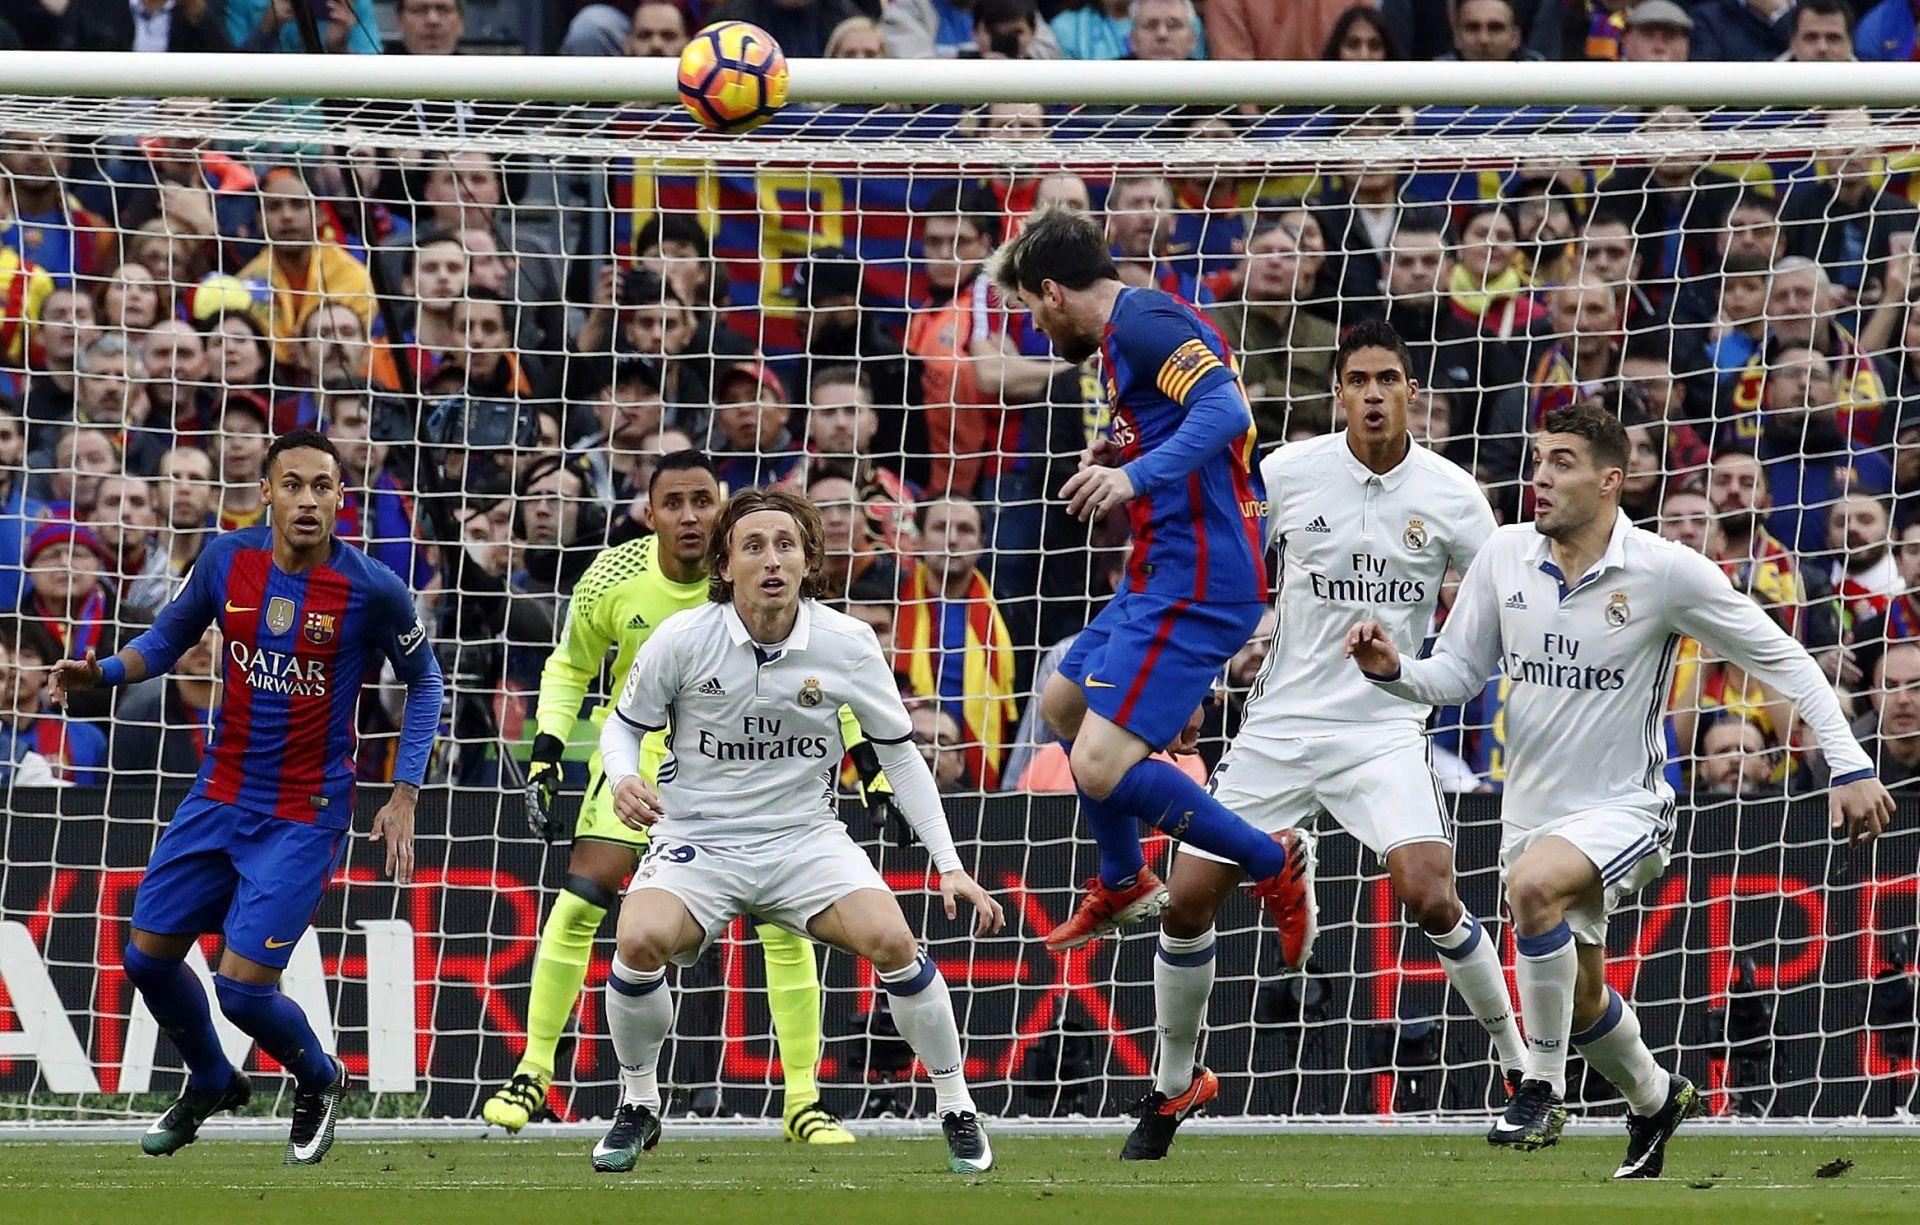 ŠPANJOLSKA LIGA: Barcelona – Real Madrid 1:1, asistencija Modrića